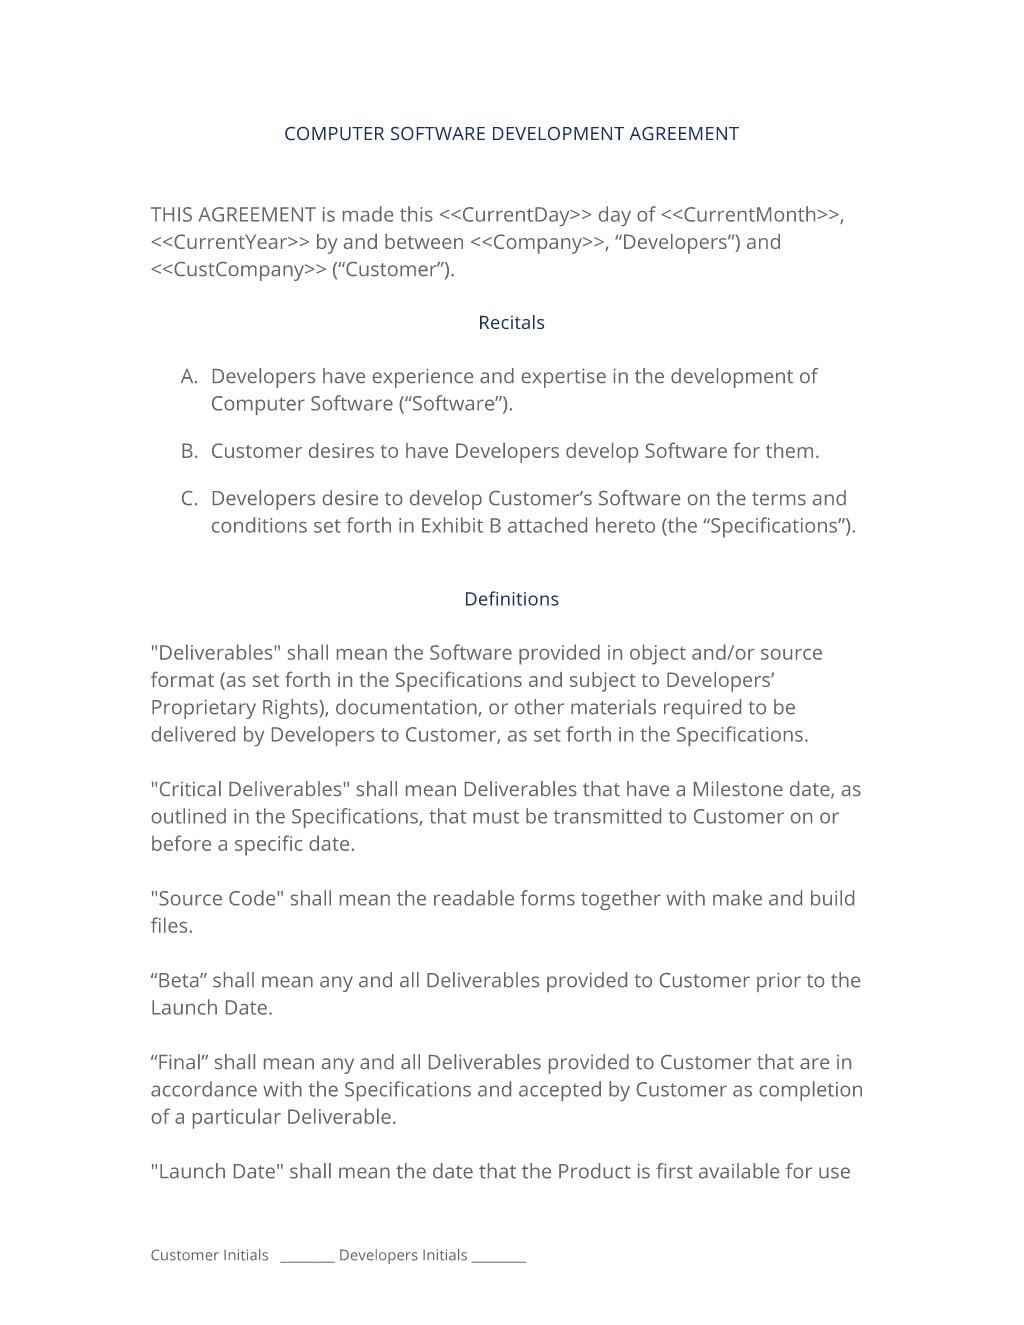 Software Developer Employment Contract Template software Development Contract 3 Easy Steps